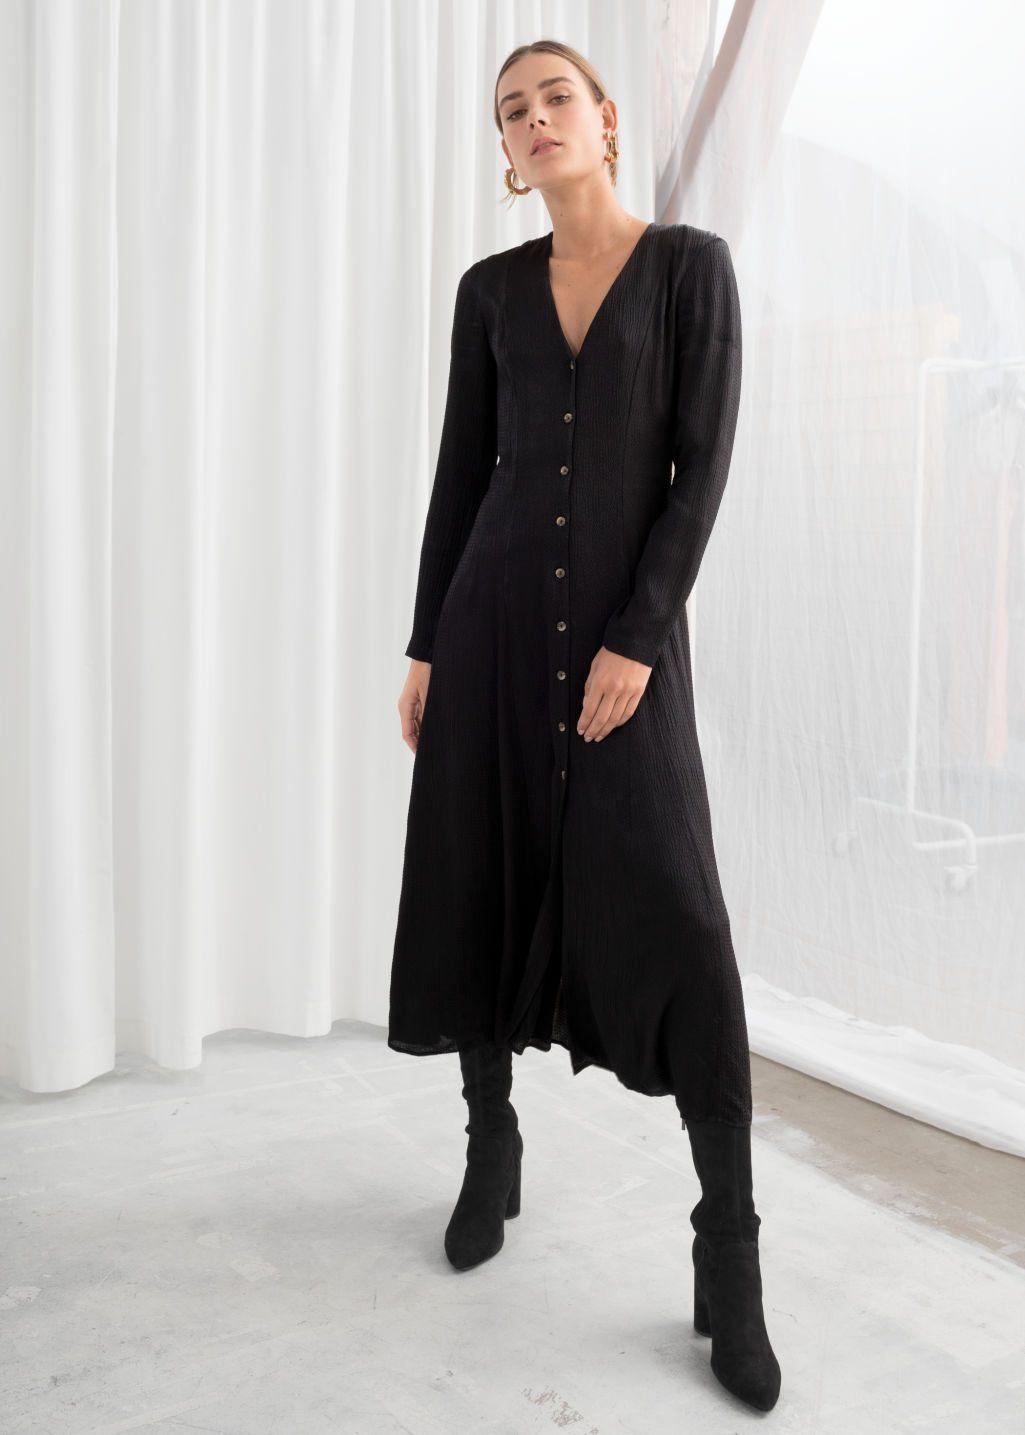 Satin Button Up Midi Dress Black Midi Dresses Other Stories Midi Dress Spring Fashion Outfits Black Turtleneck Dress [ 1435 x 1025 Pixel ]